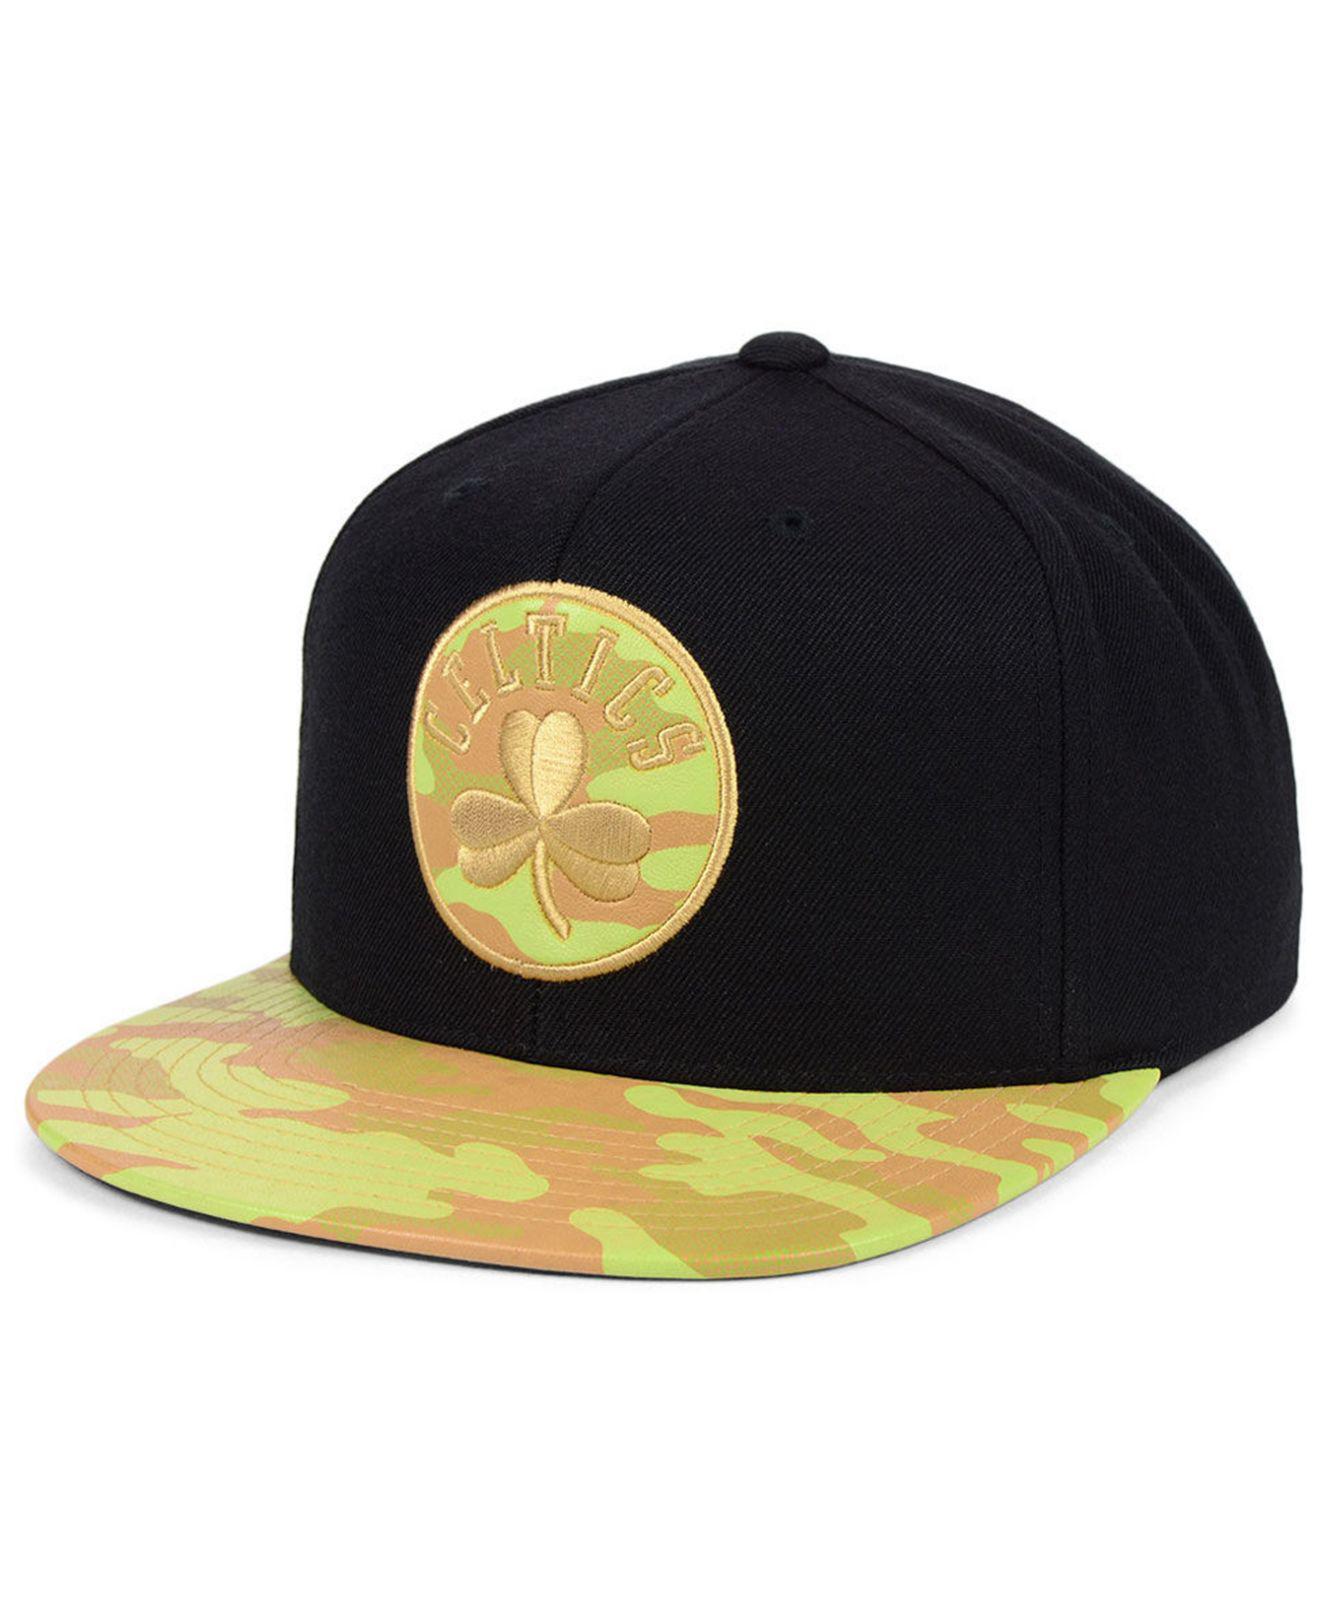 75c2b12dd412b5 Lyst - Mitchell & Ness Boston Celtics Natural Camo Snapback Cap in ...